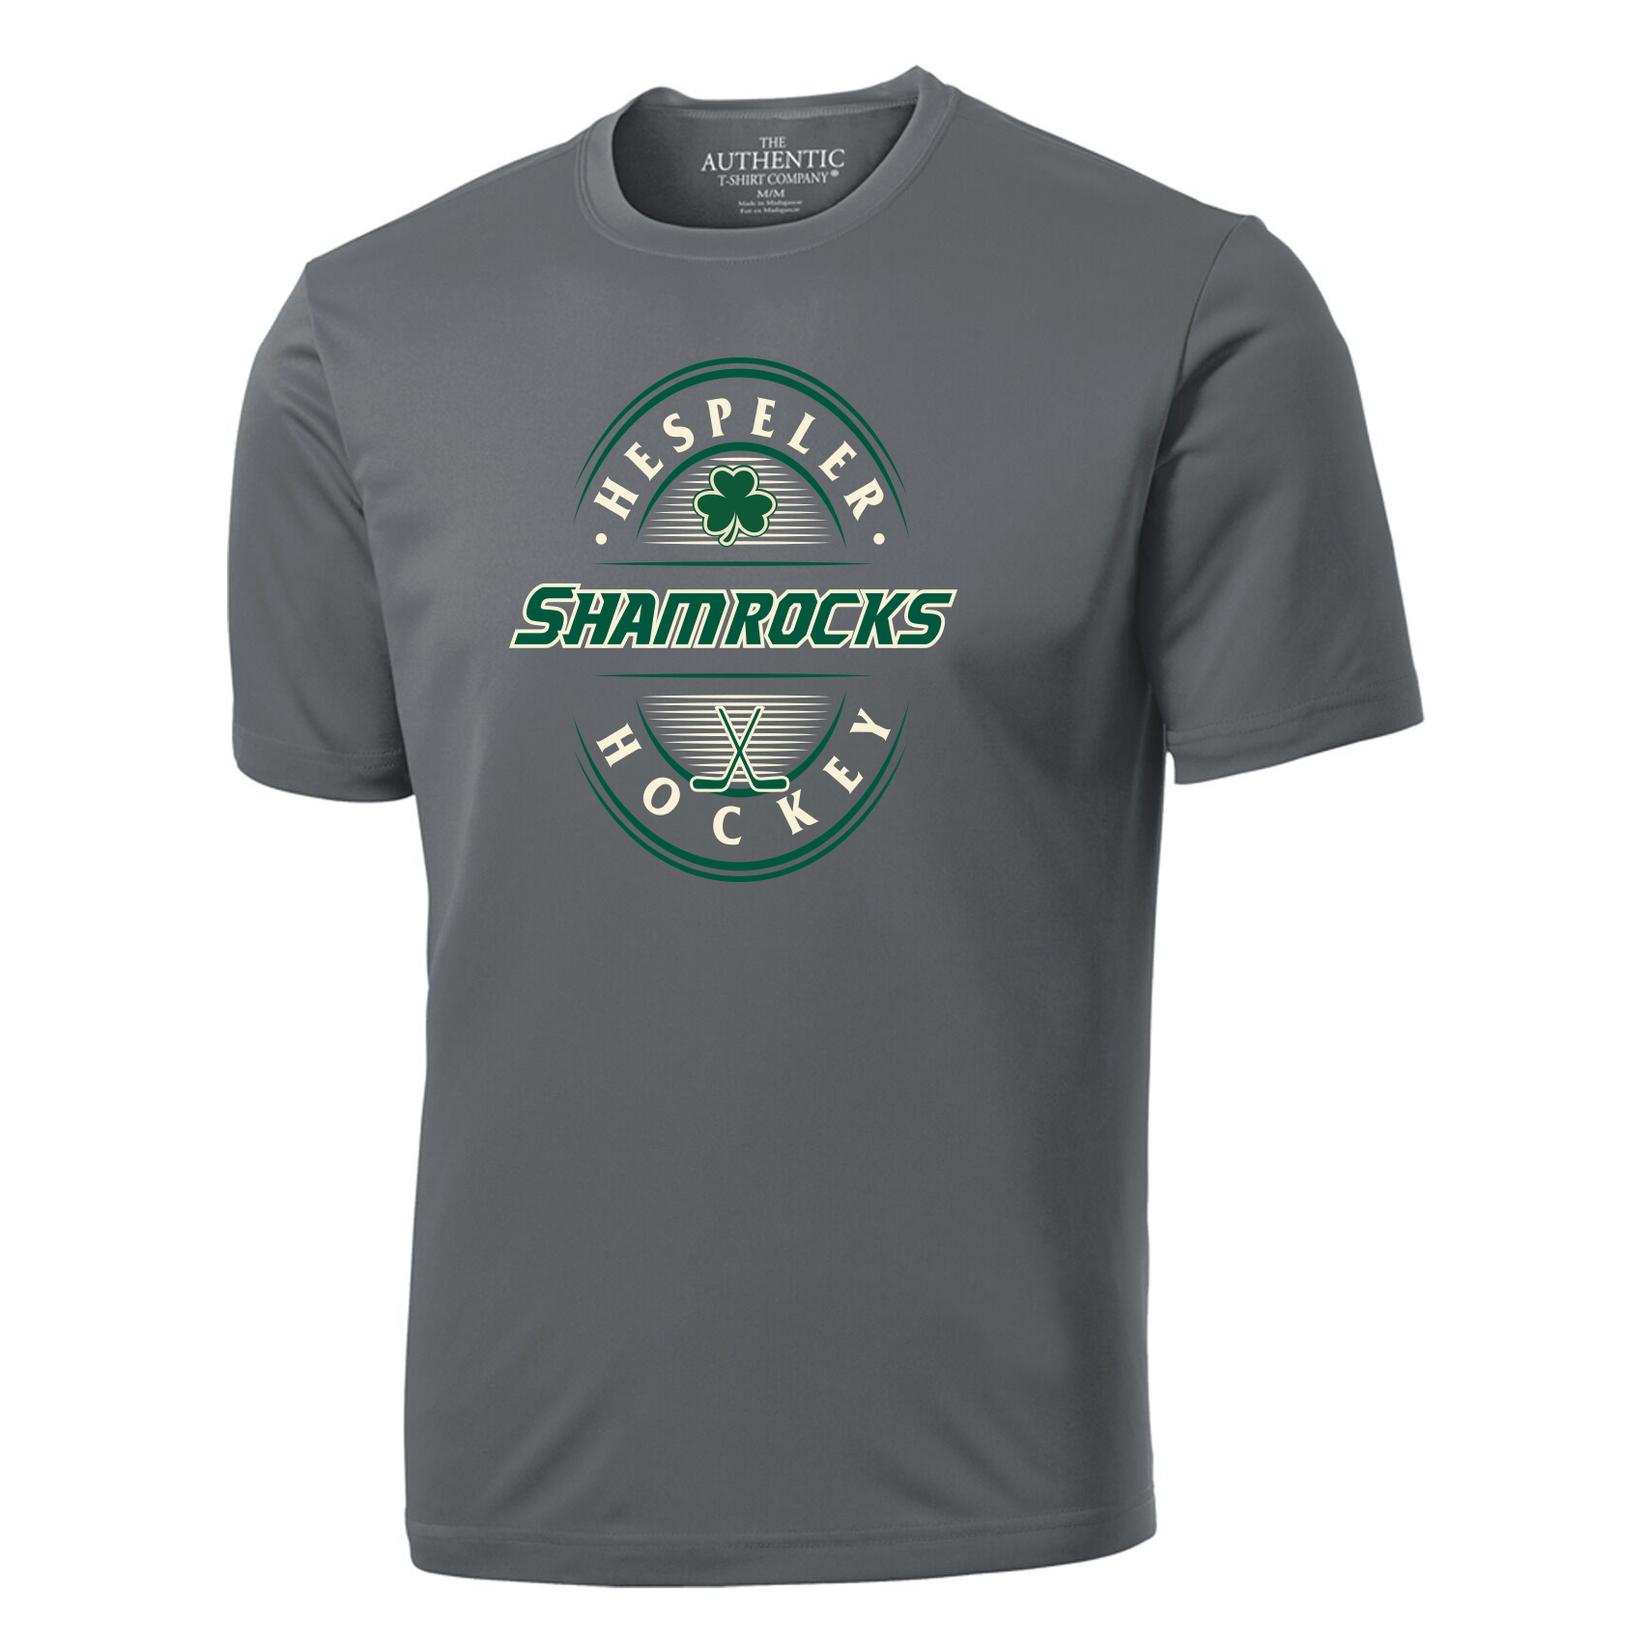 Shamrocks Short Sleeve Tech Tee - Youth